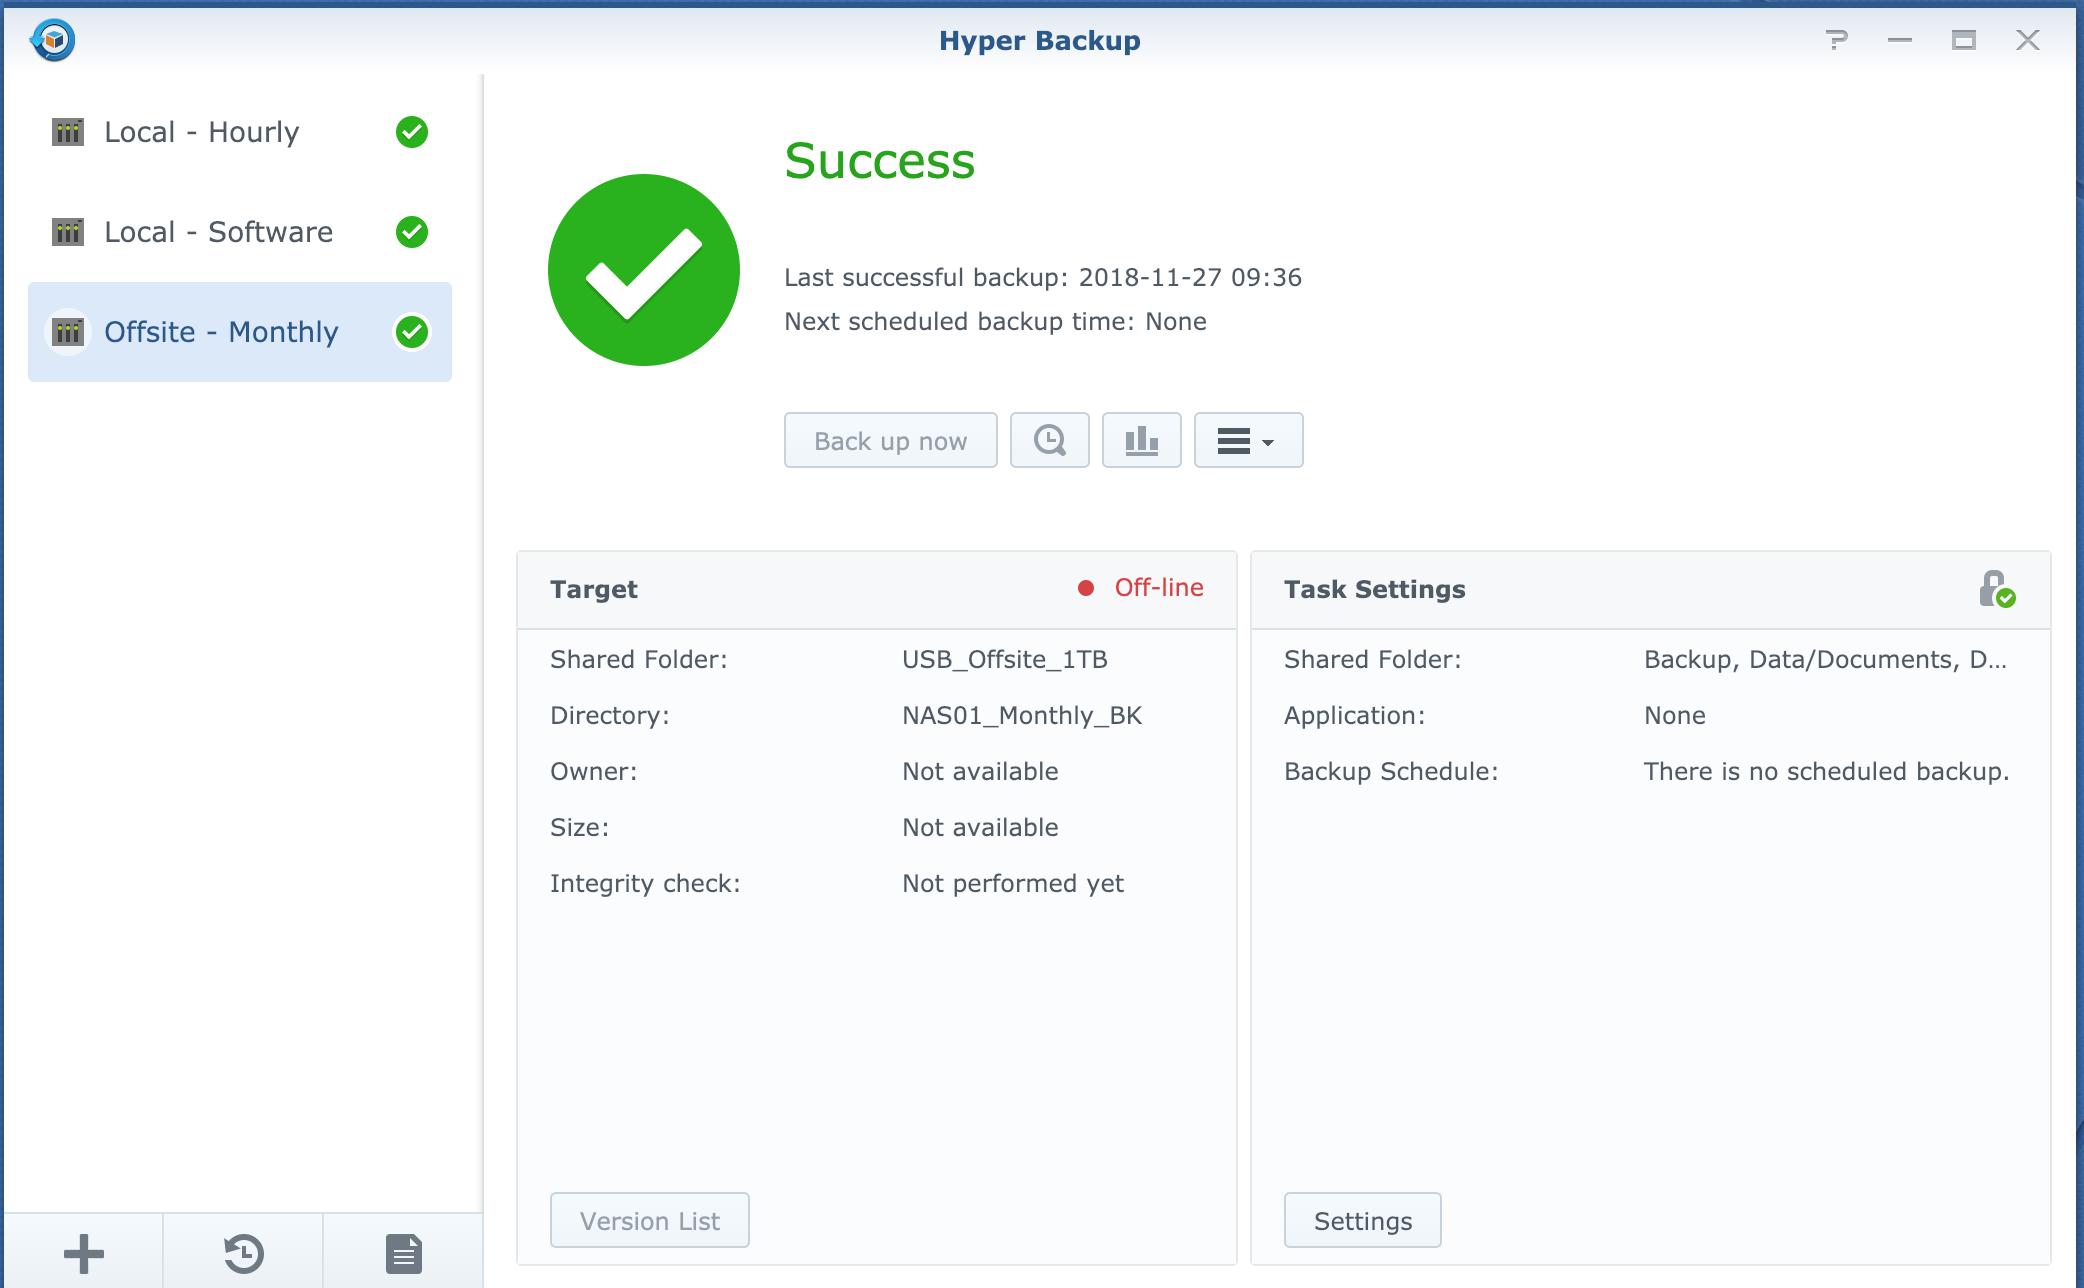 My Backup/Data Protection Plan